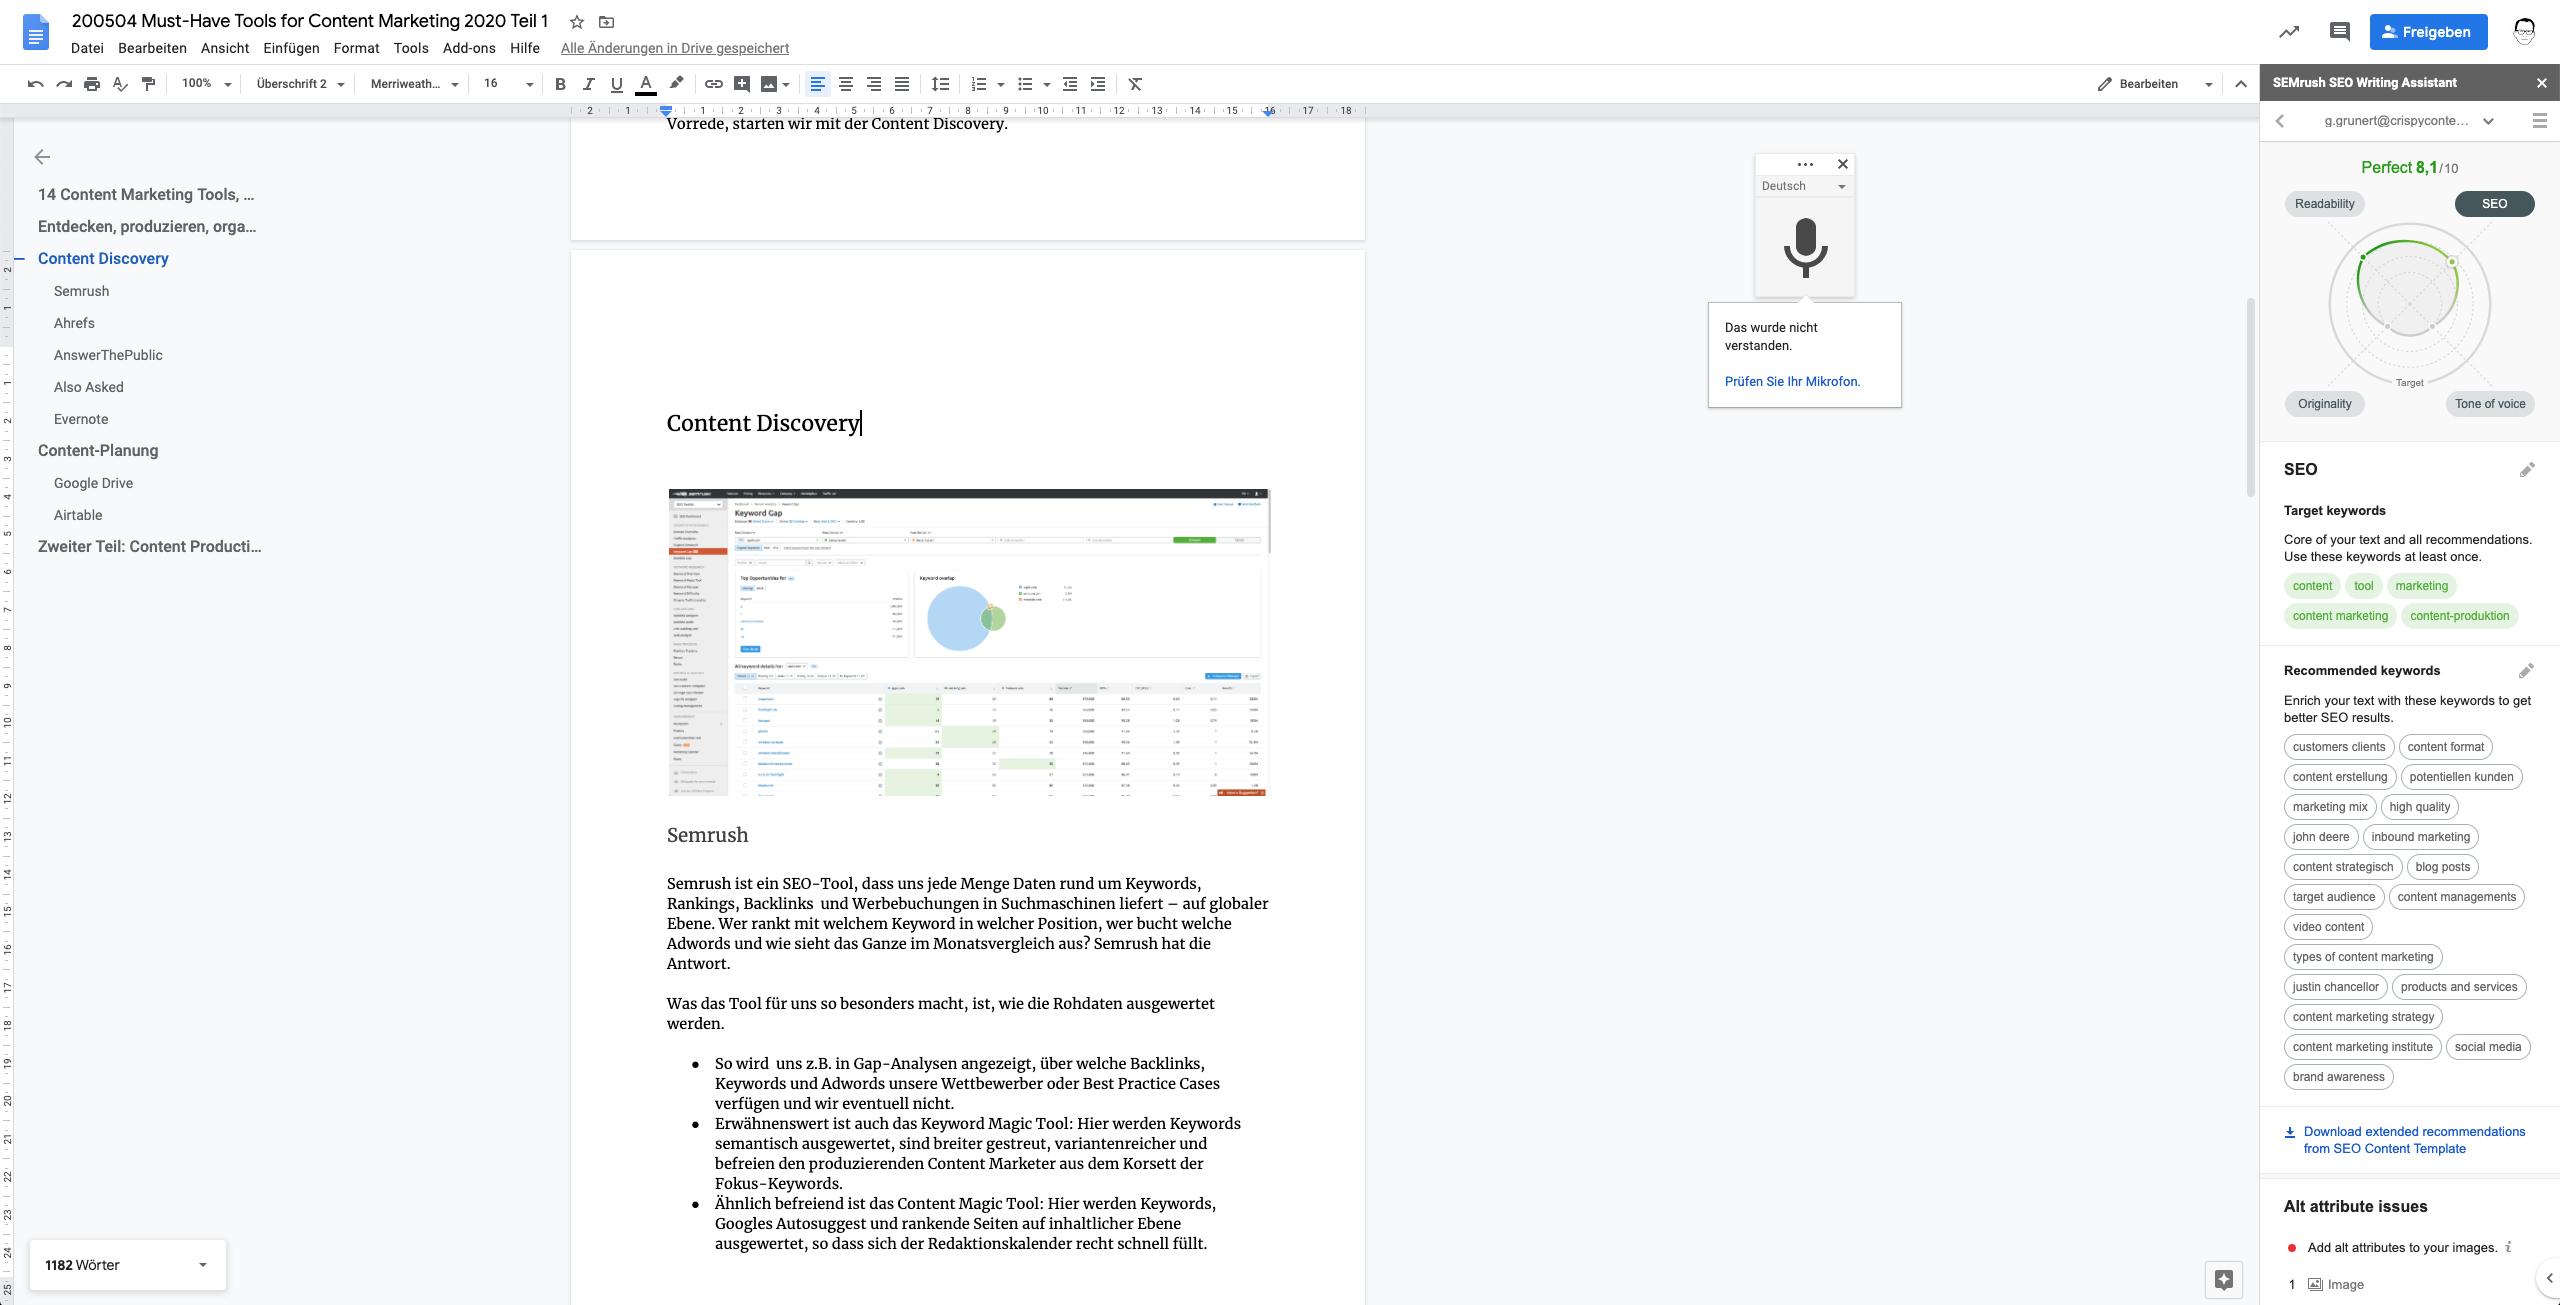 Content Marketing Tools Essentials, SemRush Writing Assistant, Crispy Content®